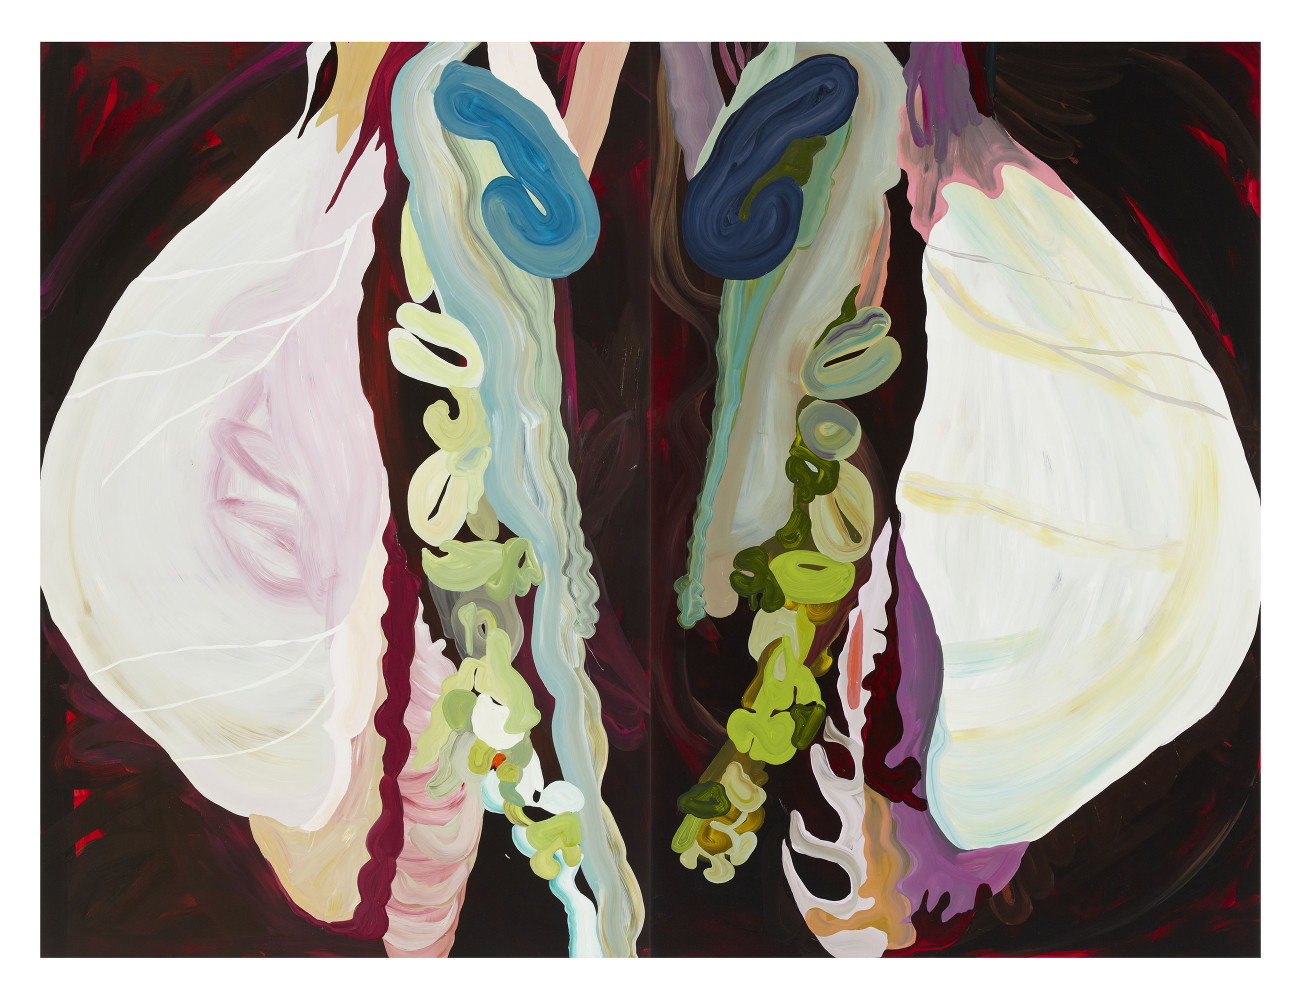 Clare Woods, 'Splendors & Miseries', 2014